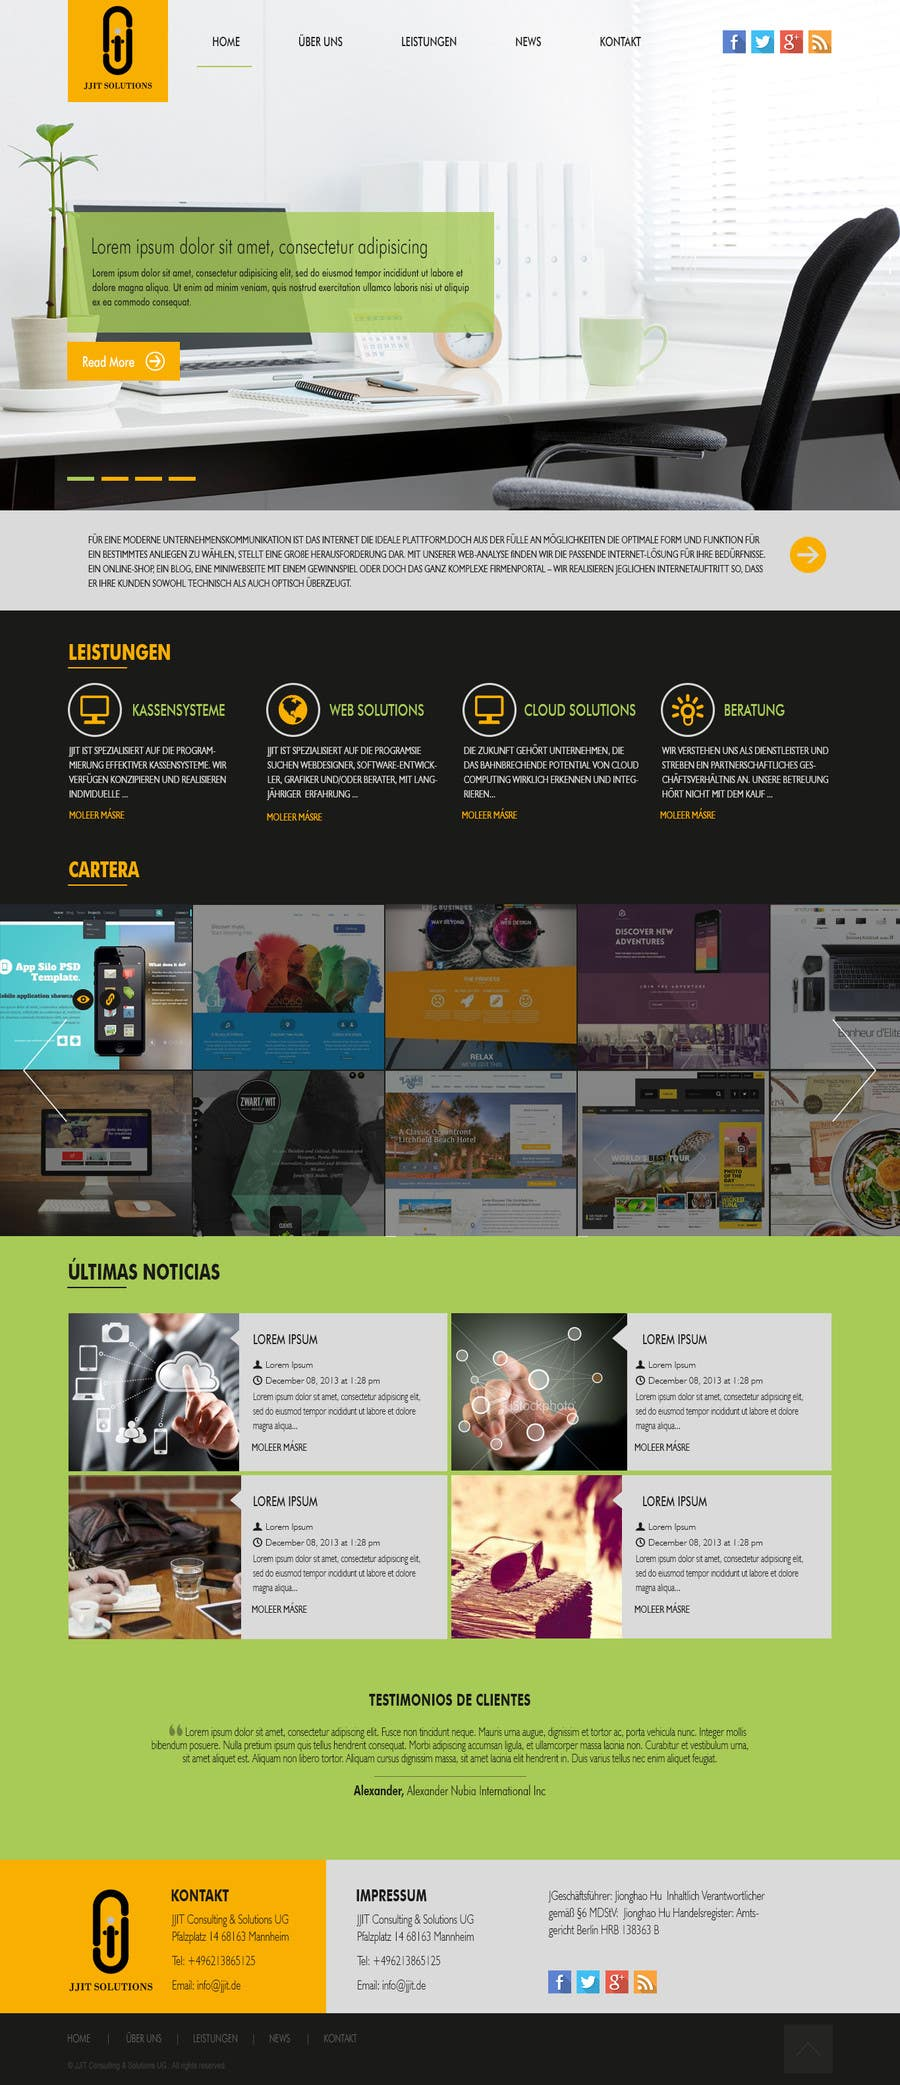 Bài tham dự cuộc thi #16 cho Design a Website Mockup for IT Company